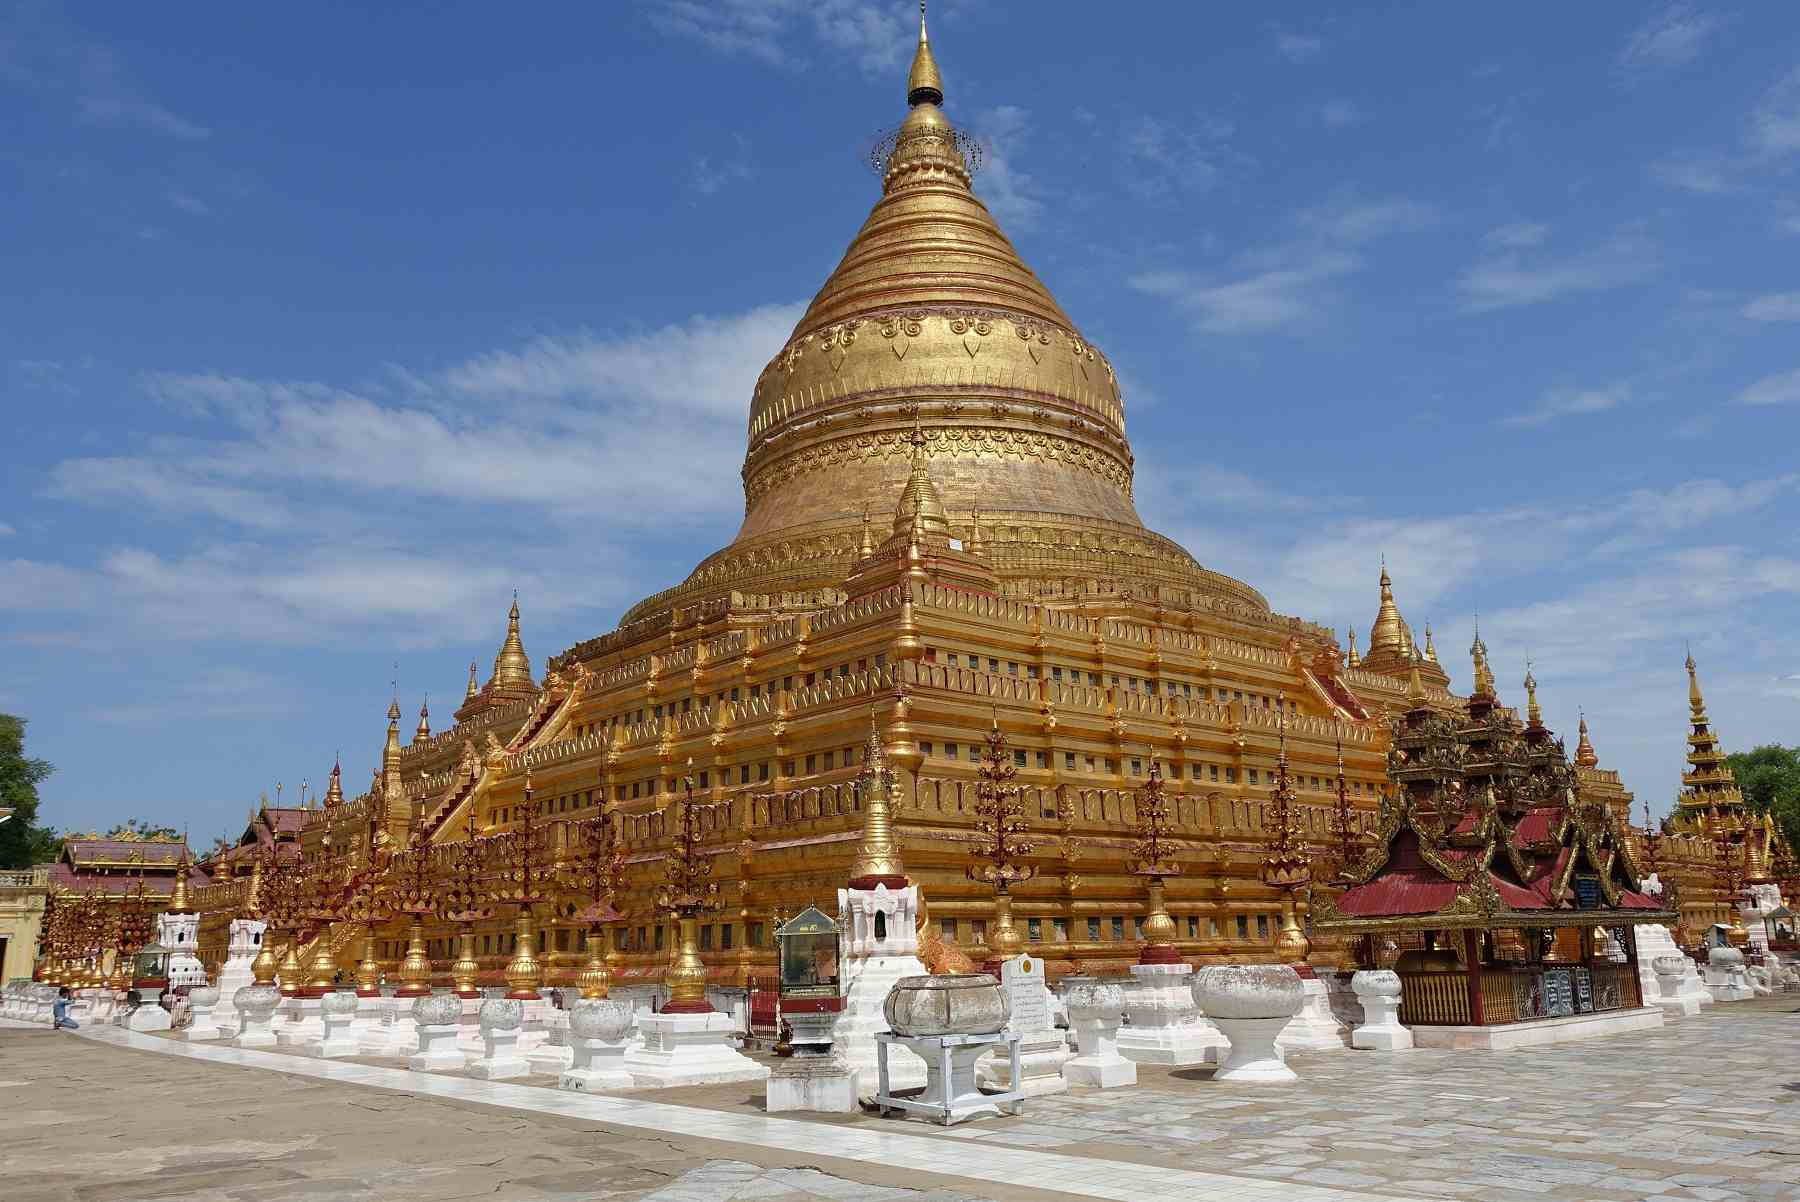 Shwezigon Temple in Bagan, Myanmar